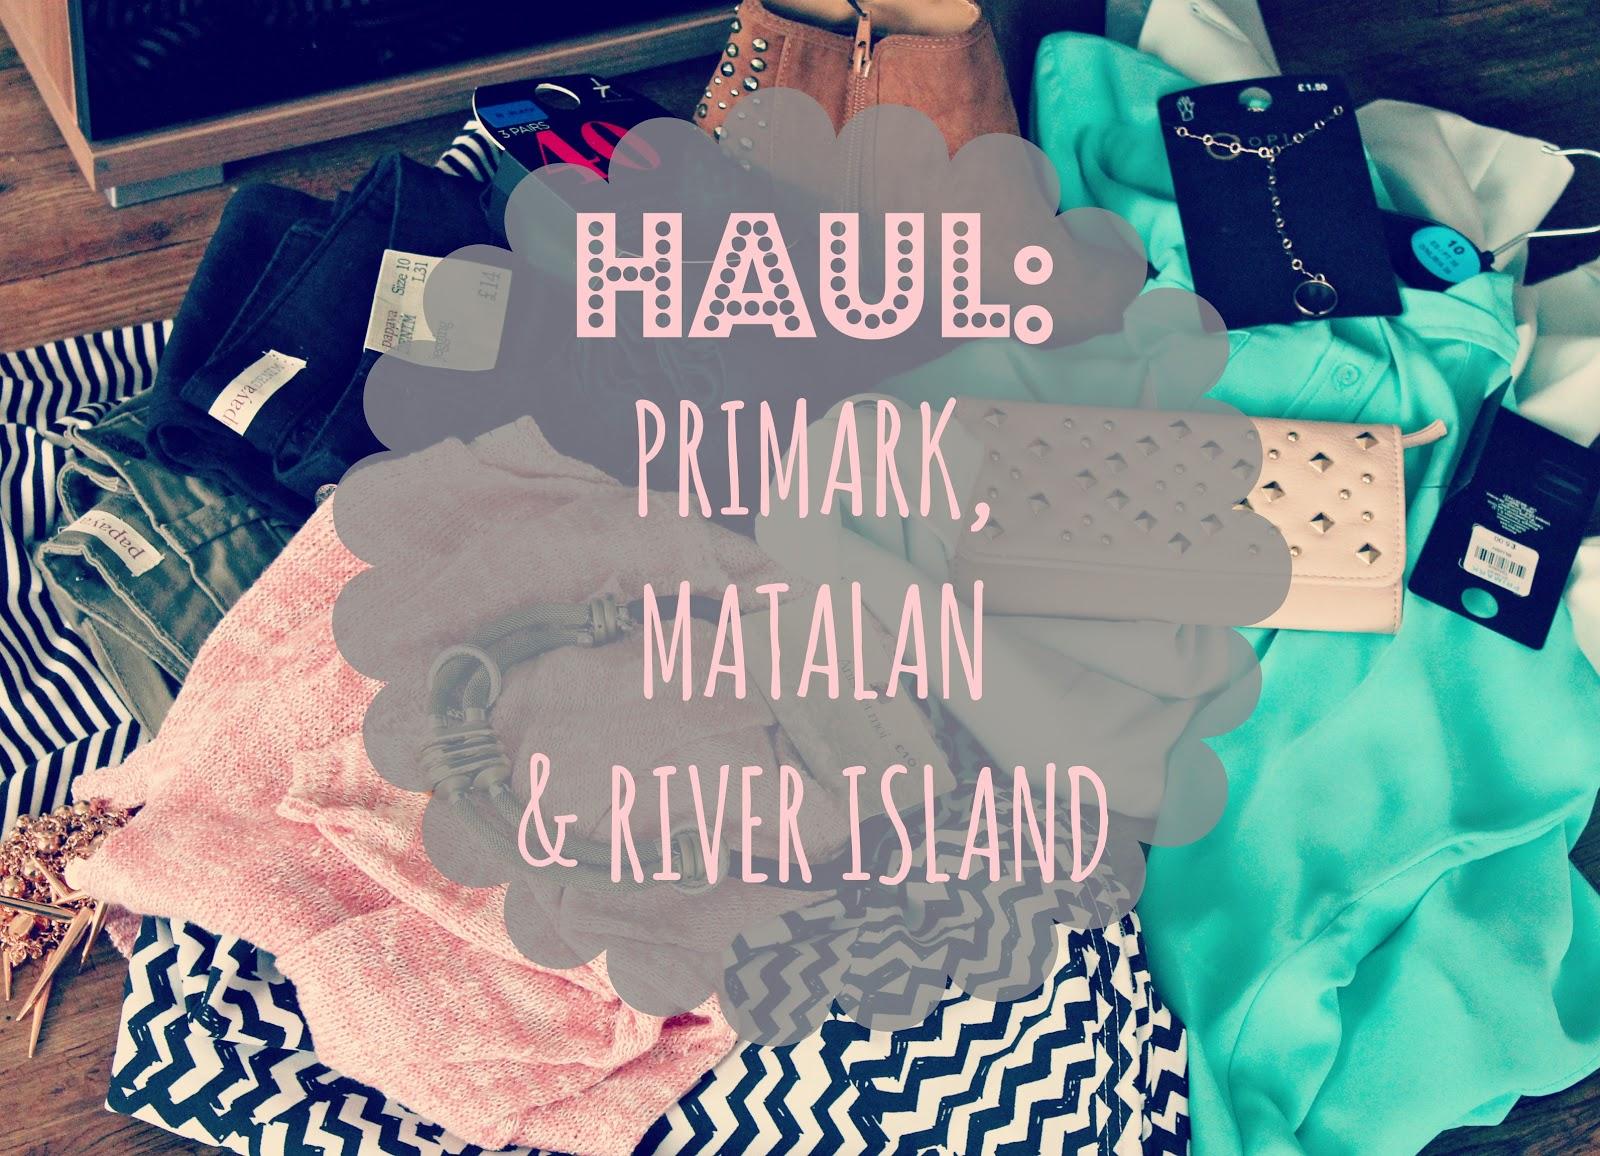 Haul clothing online